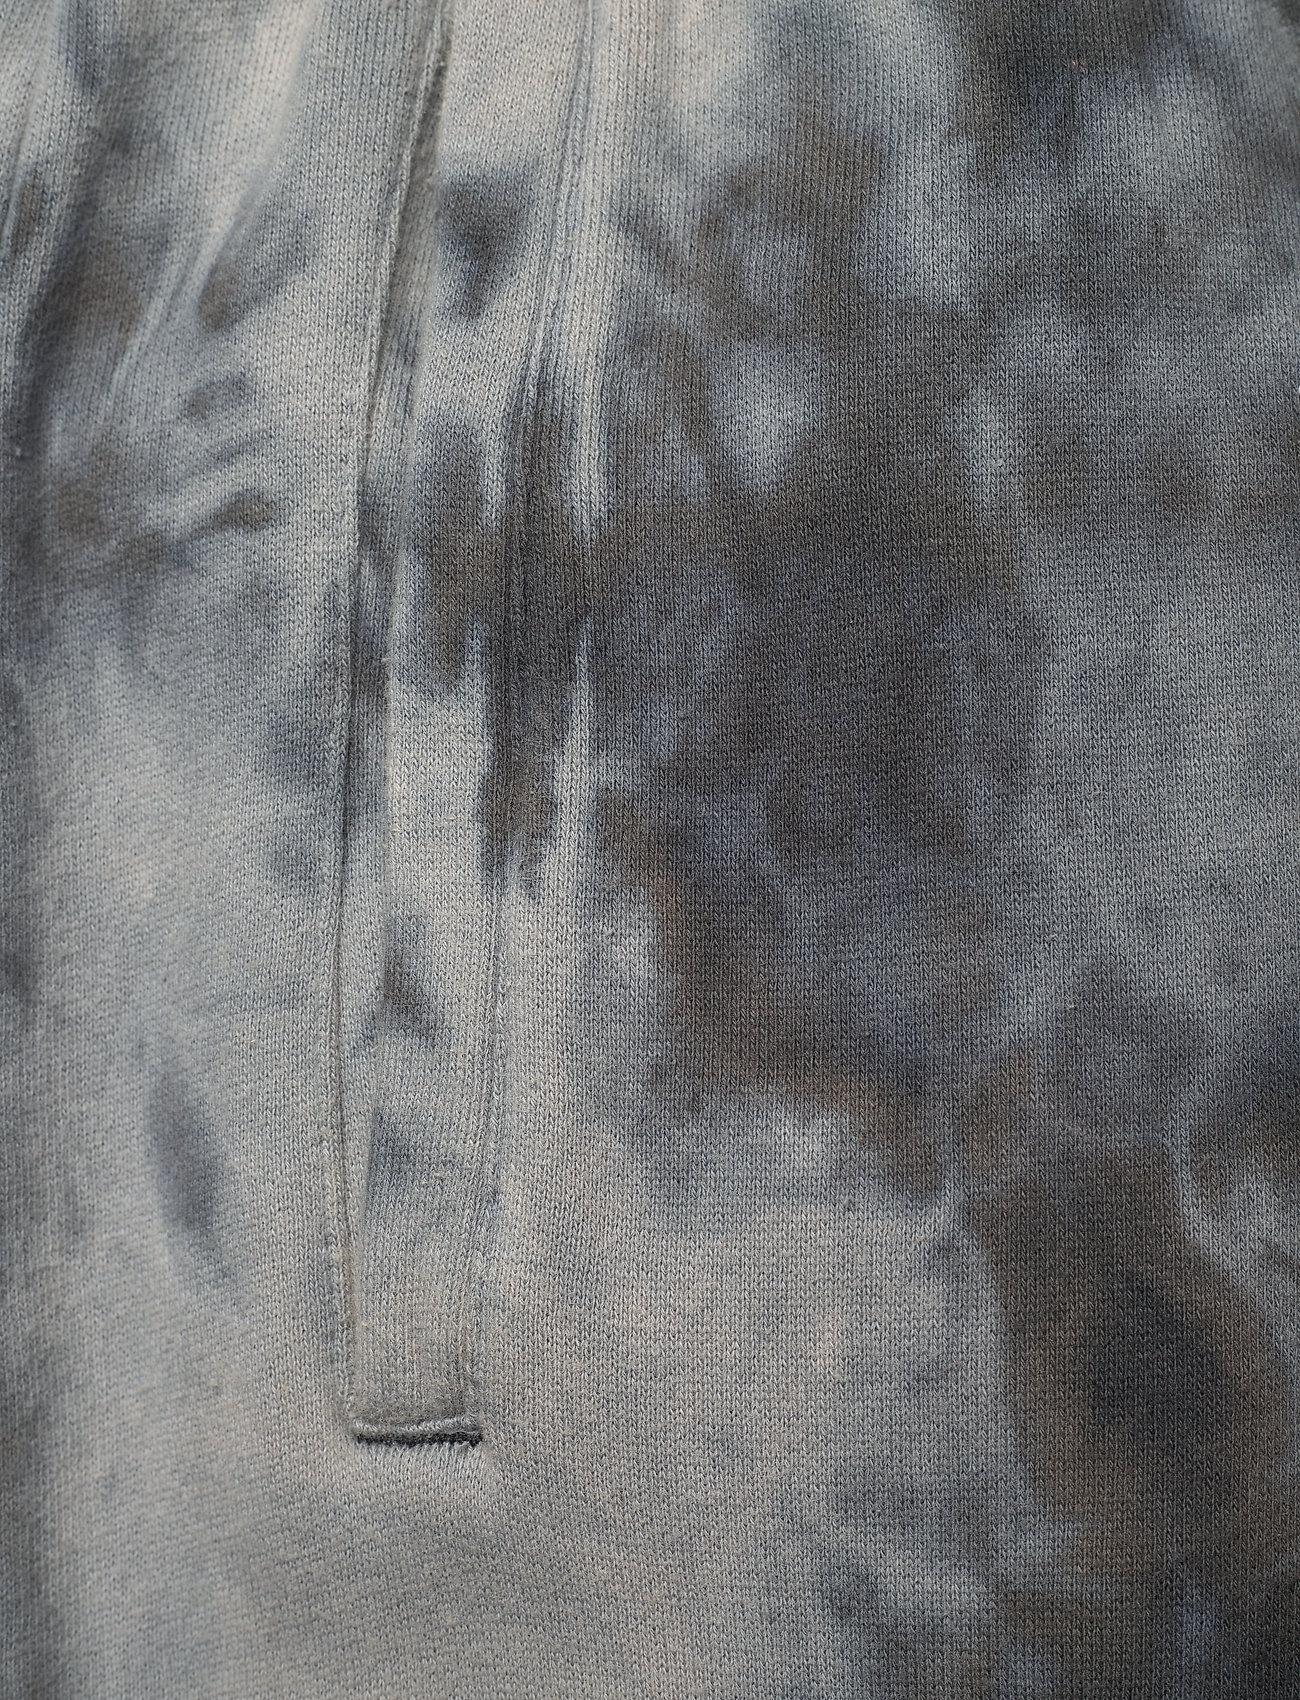 HAN Kjøbenhavn - Sweat Pants - joggingbroek - black acid - 2